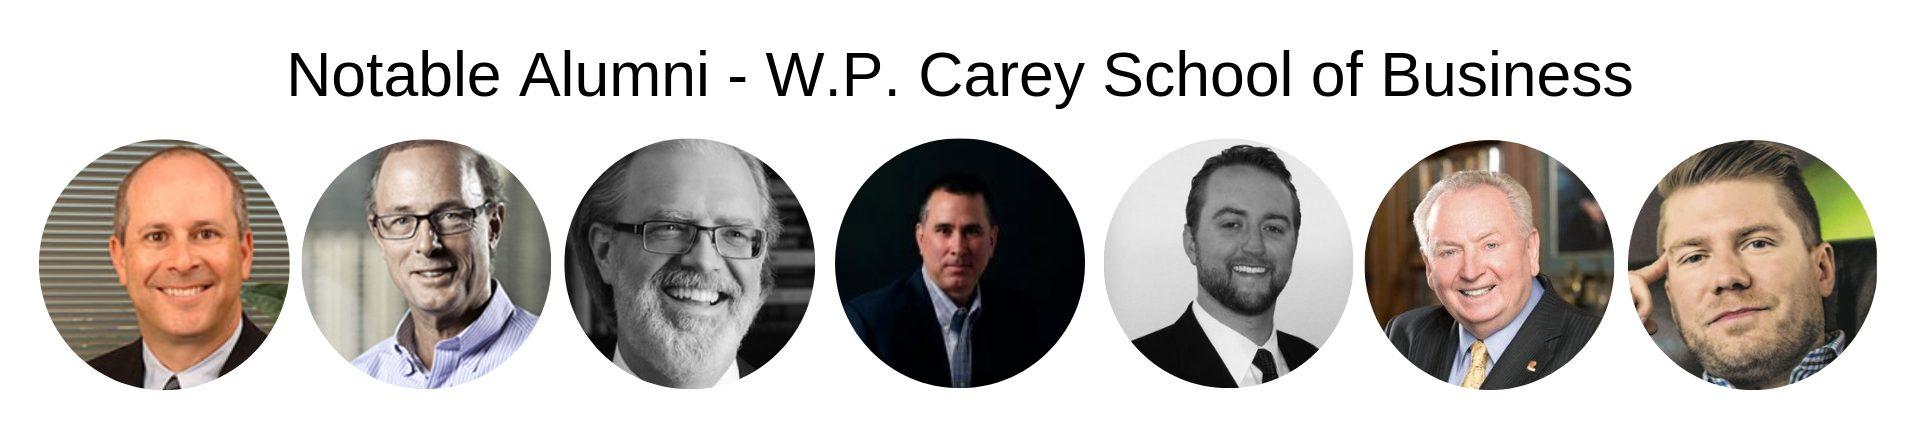 ASU MBA Program - W.P. Carey School of Business - Notable Alumni